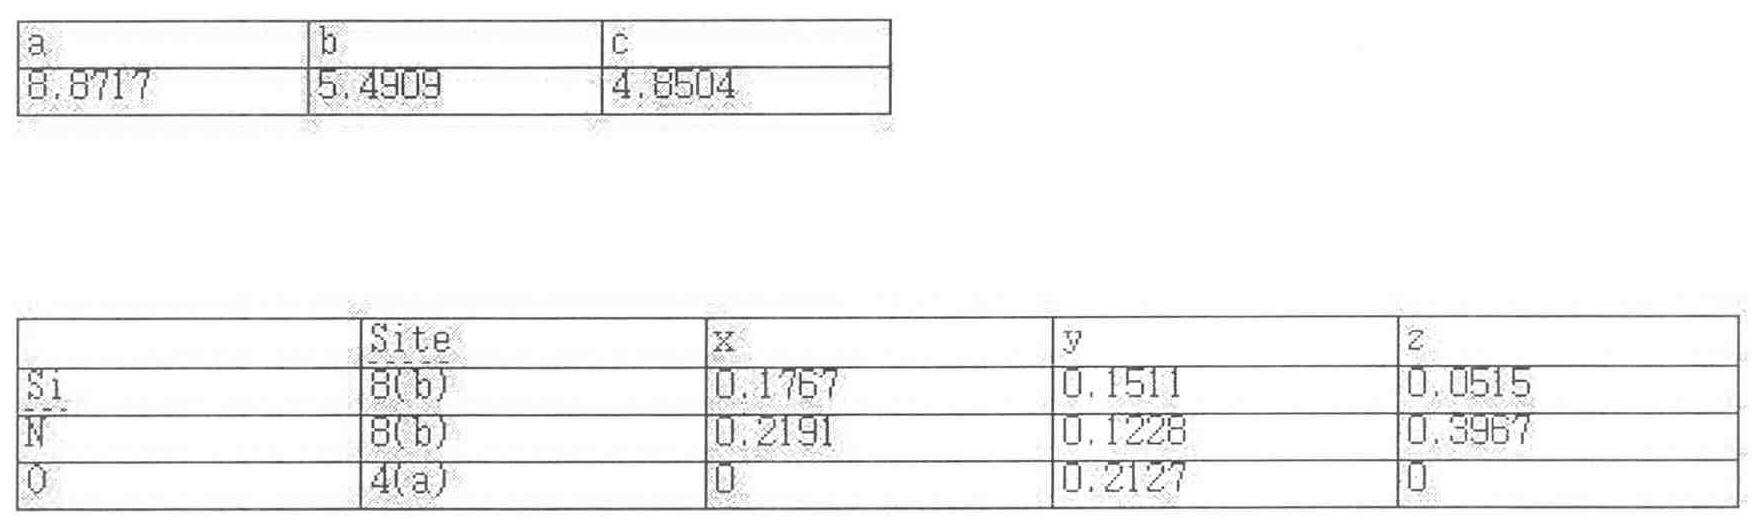 Figure 112012500366502-pct00063